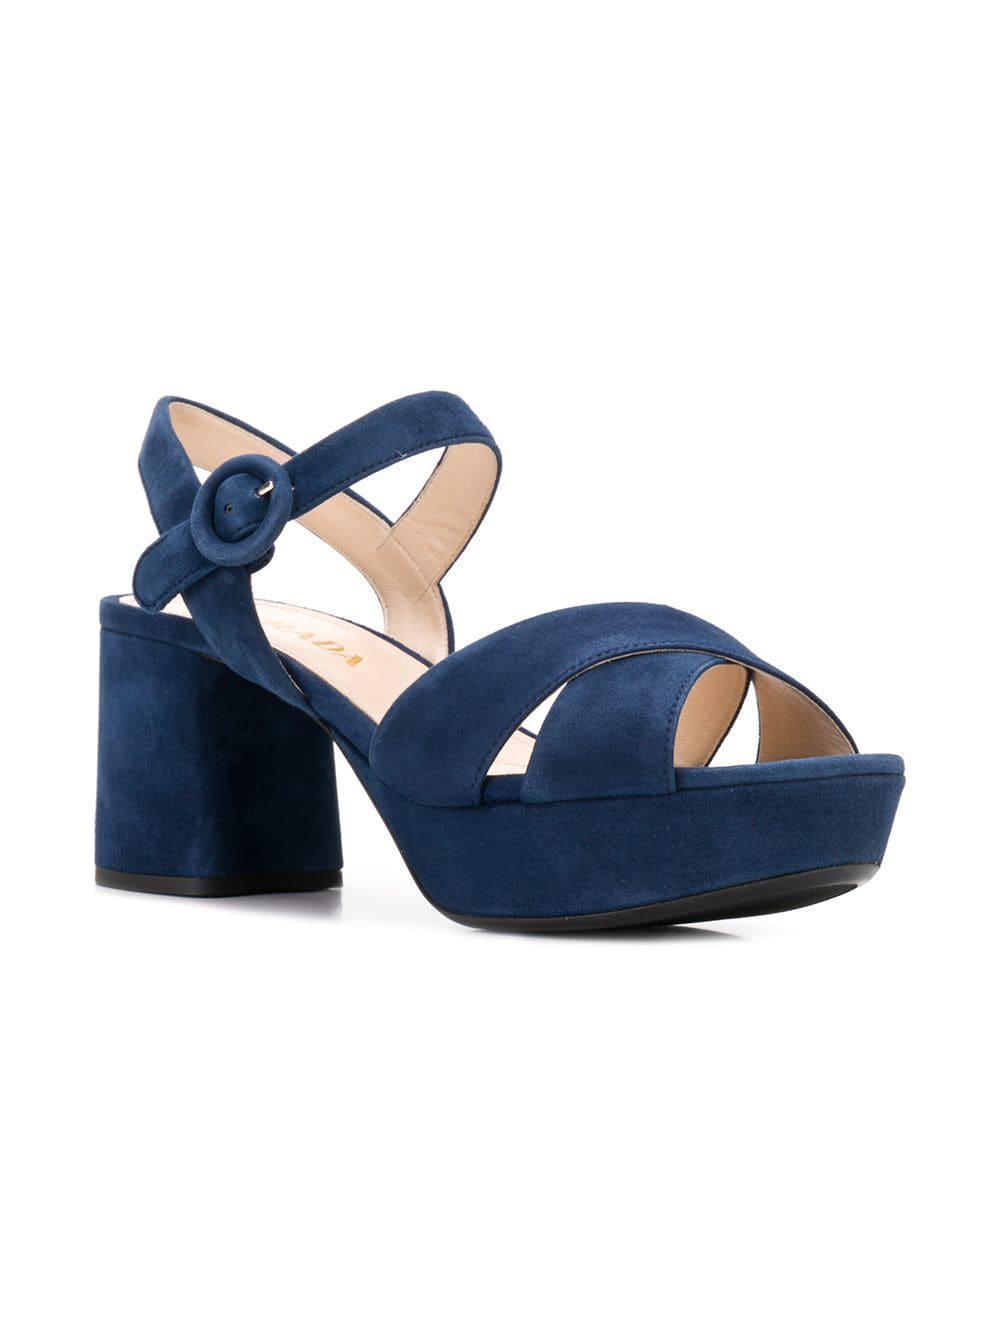 bff871f9c35 Lyst - Prada Platform Sandals in Blue